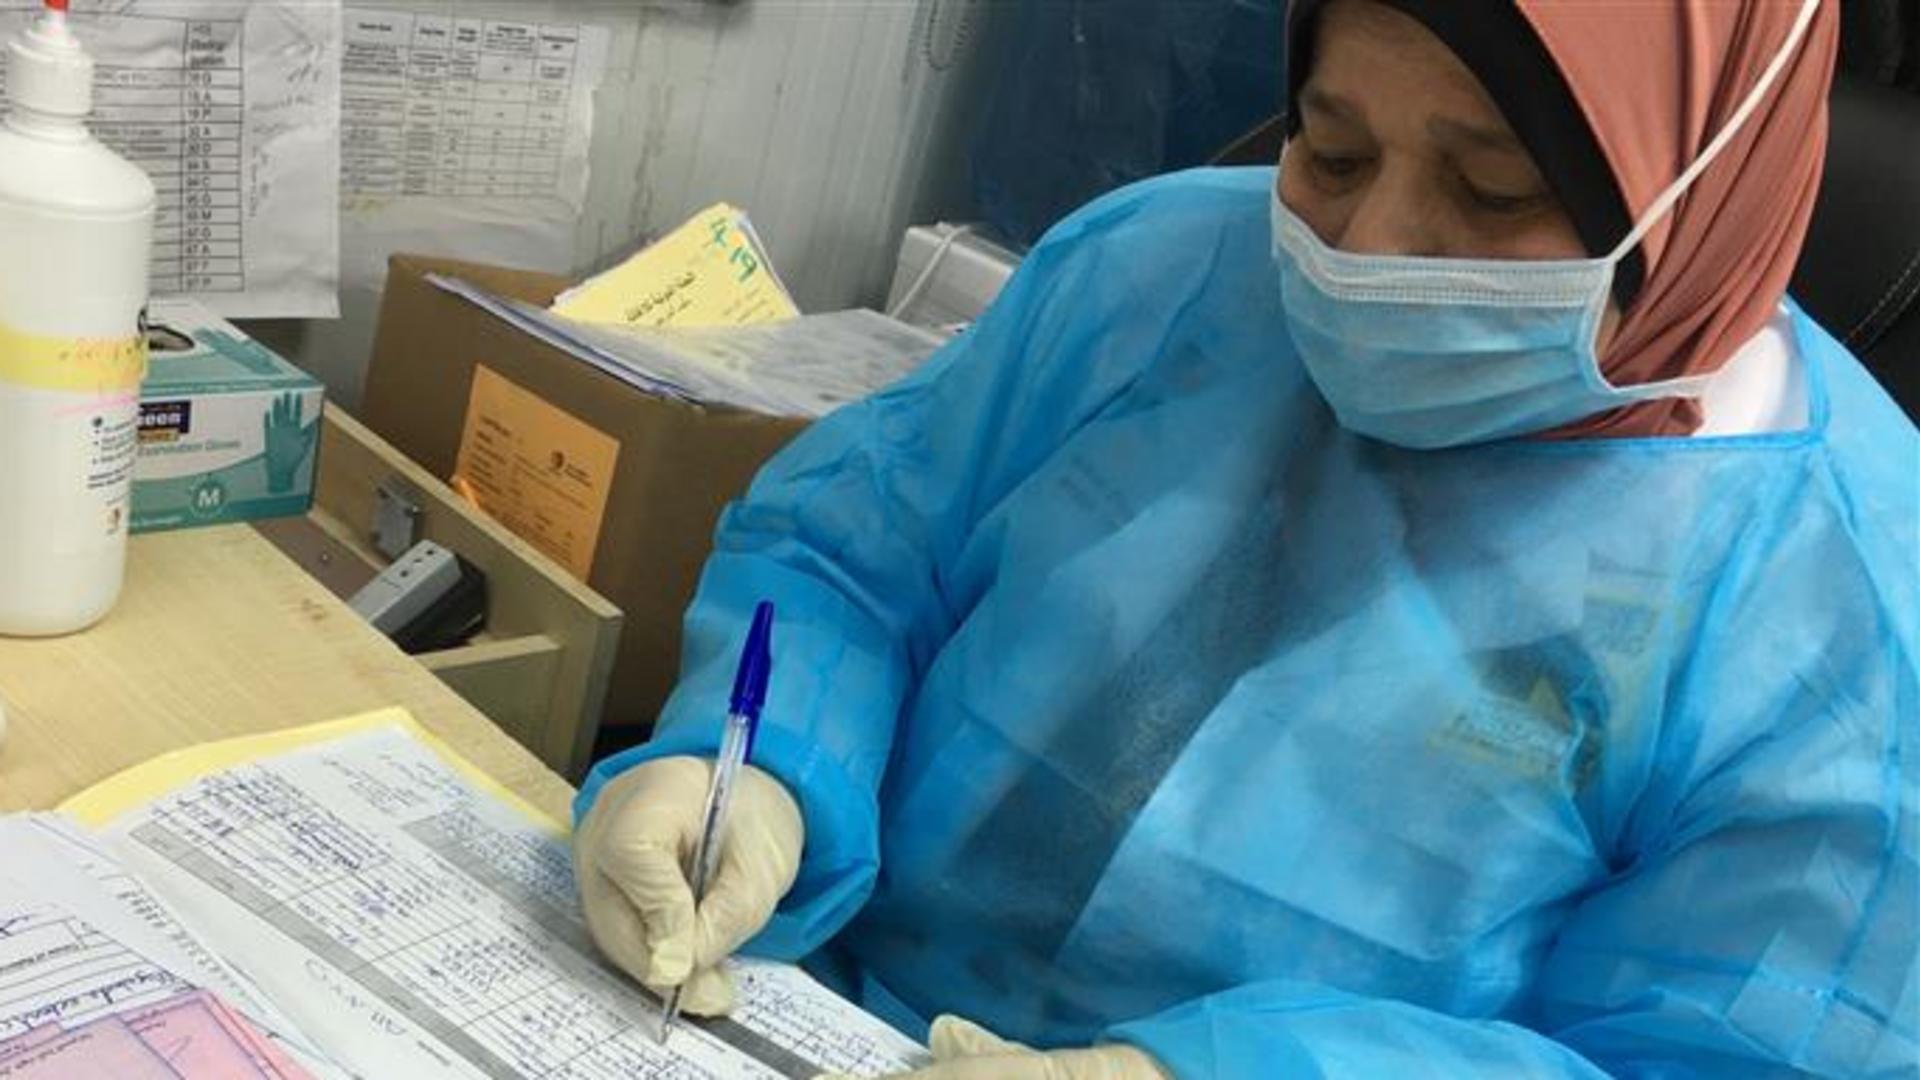 An IRC staff member in Jordan looks over paperwork.